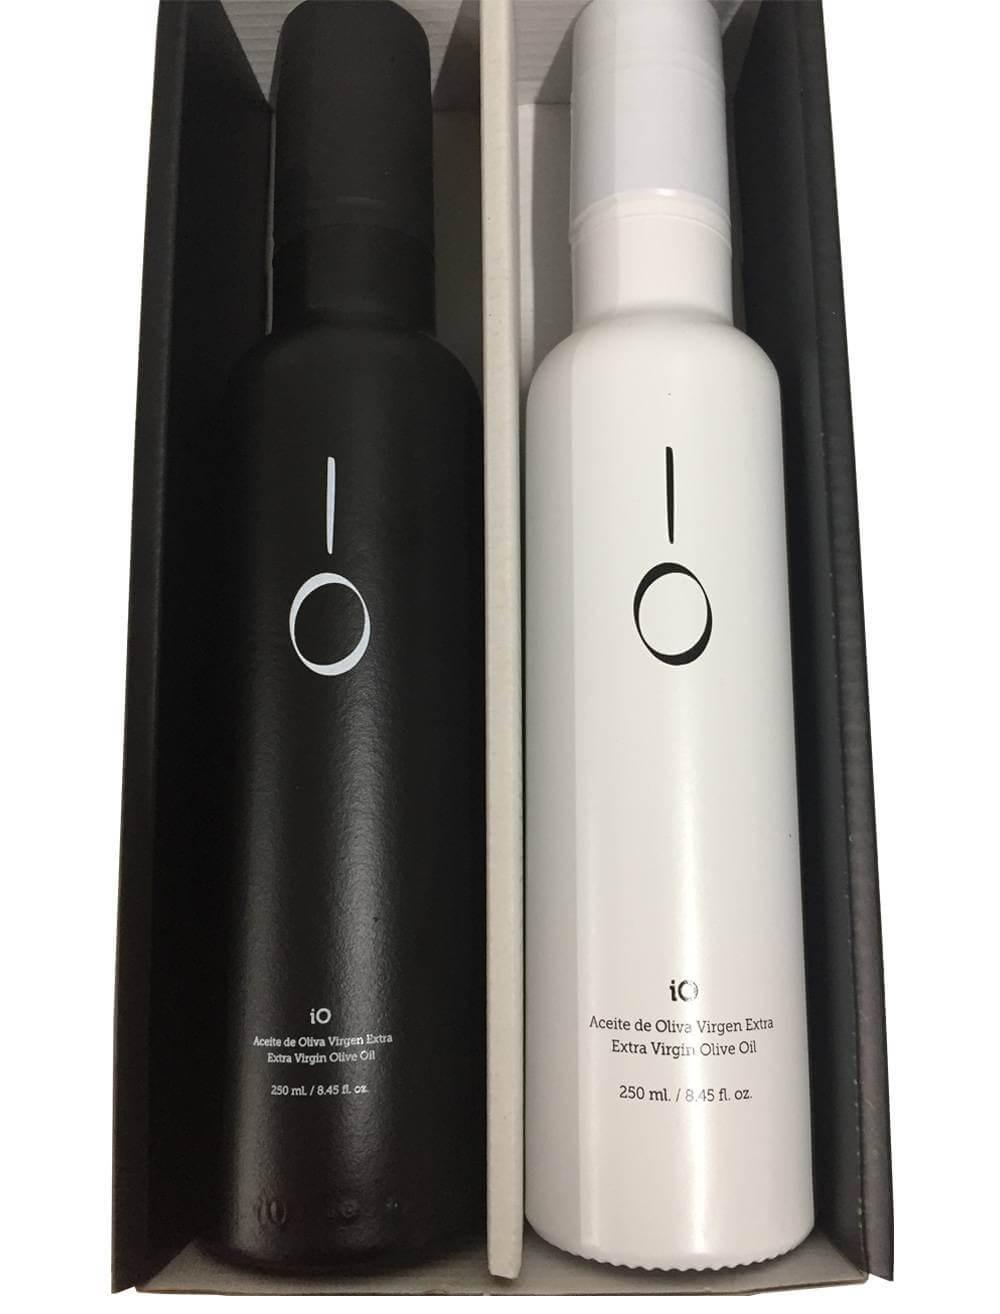 Elegant case with two olive iO White and iO Black